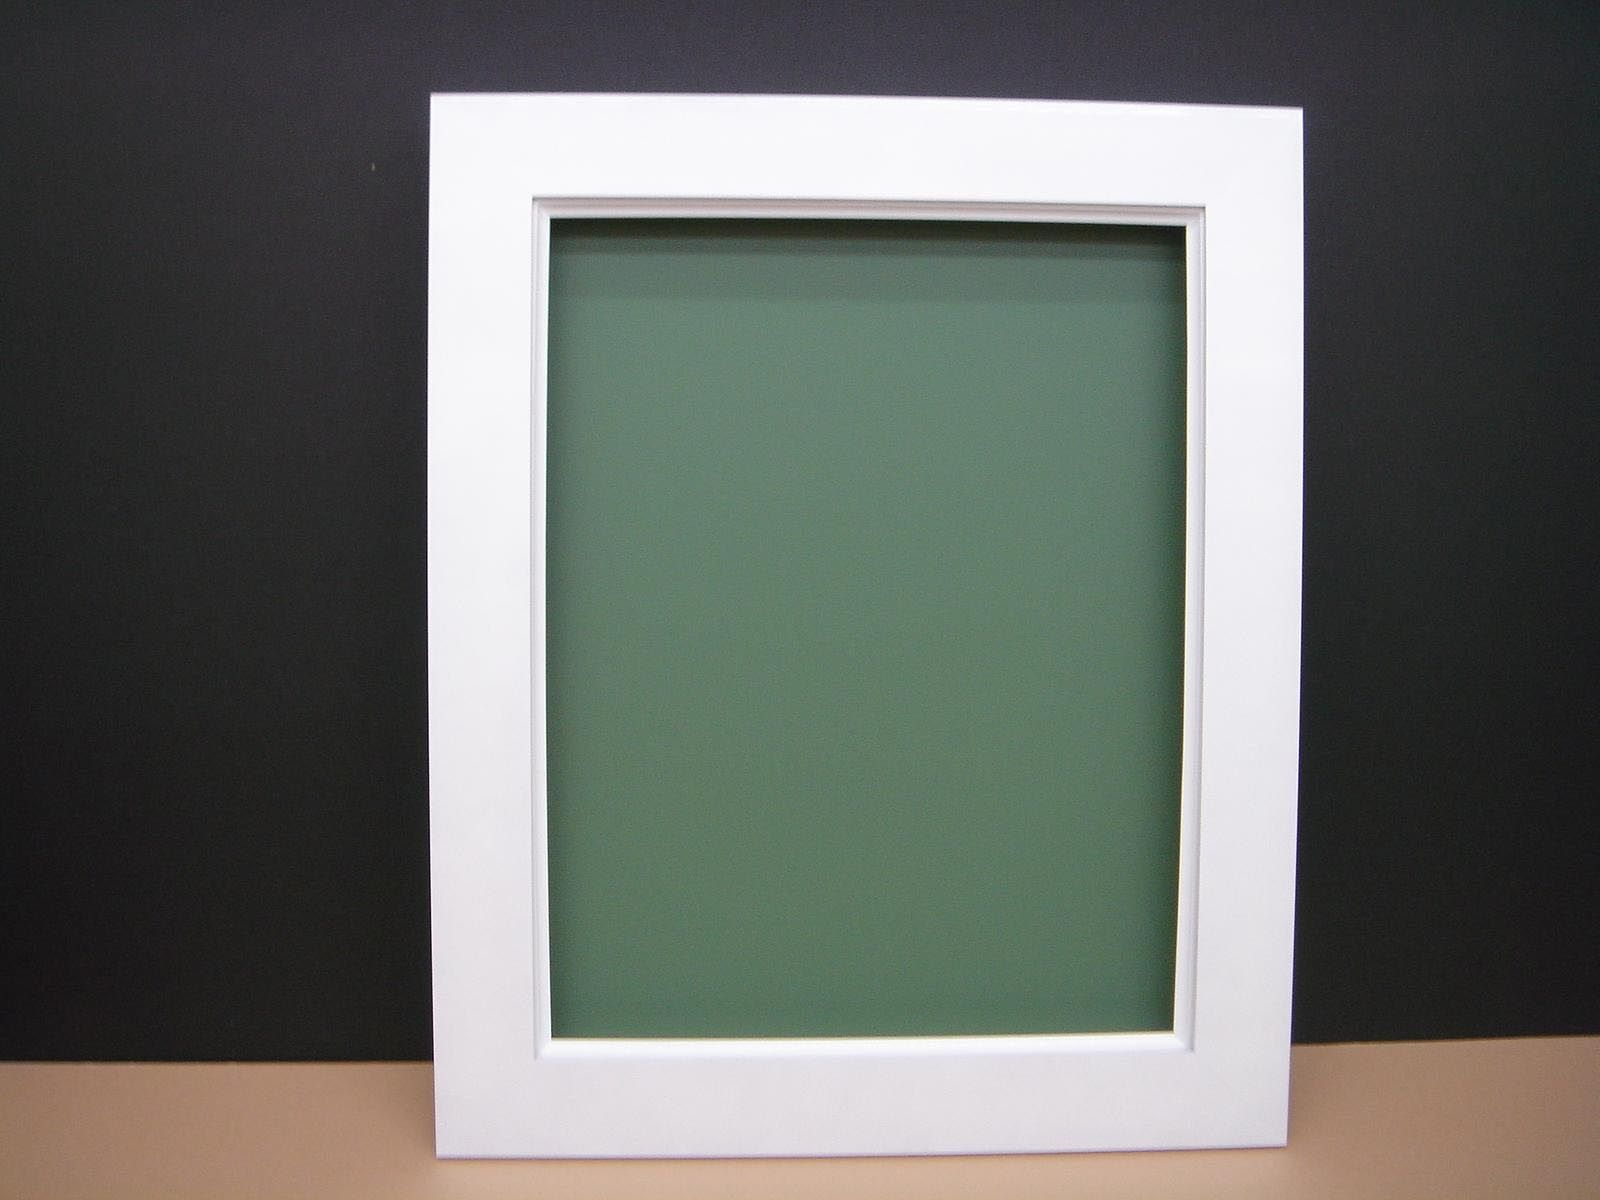 painting picture frames white | frames | pinterest